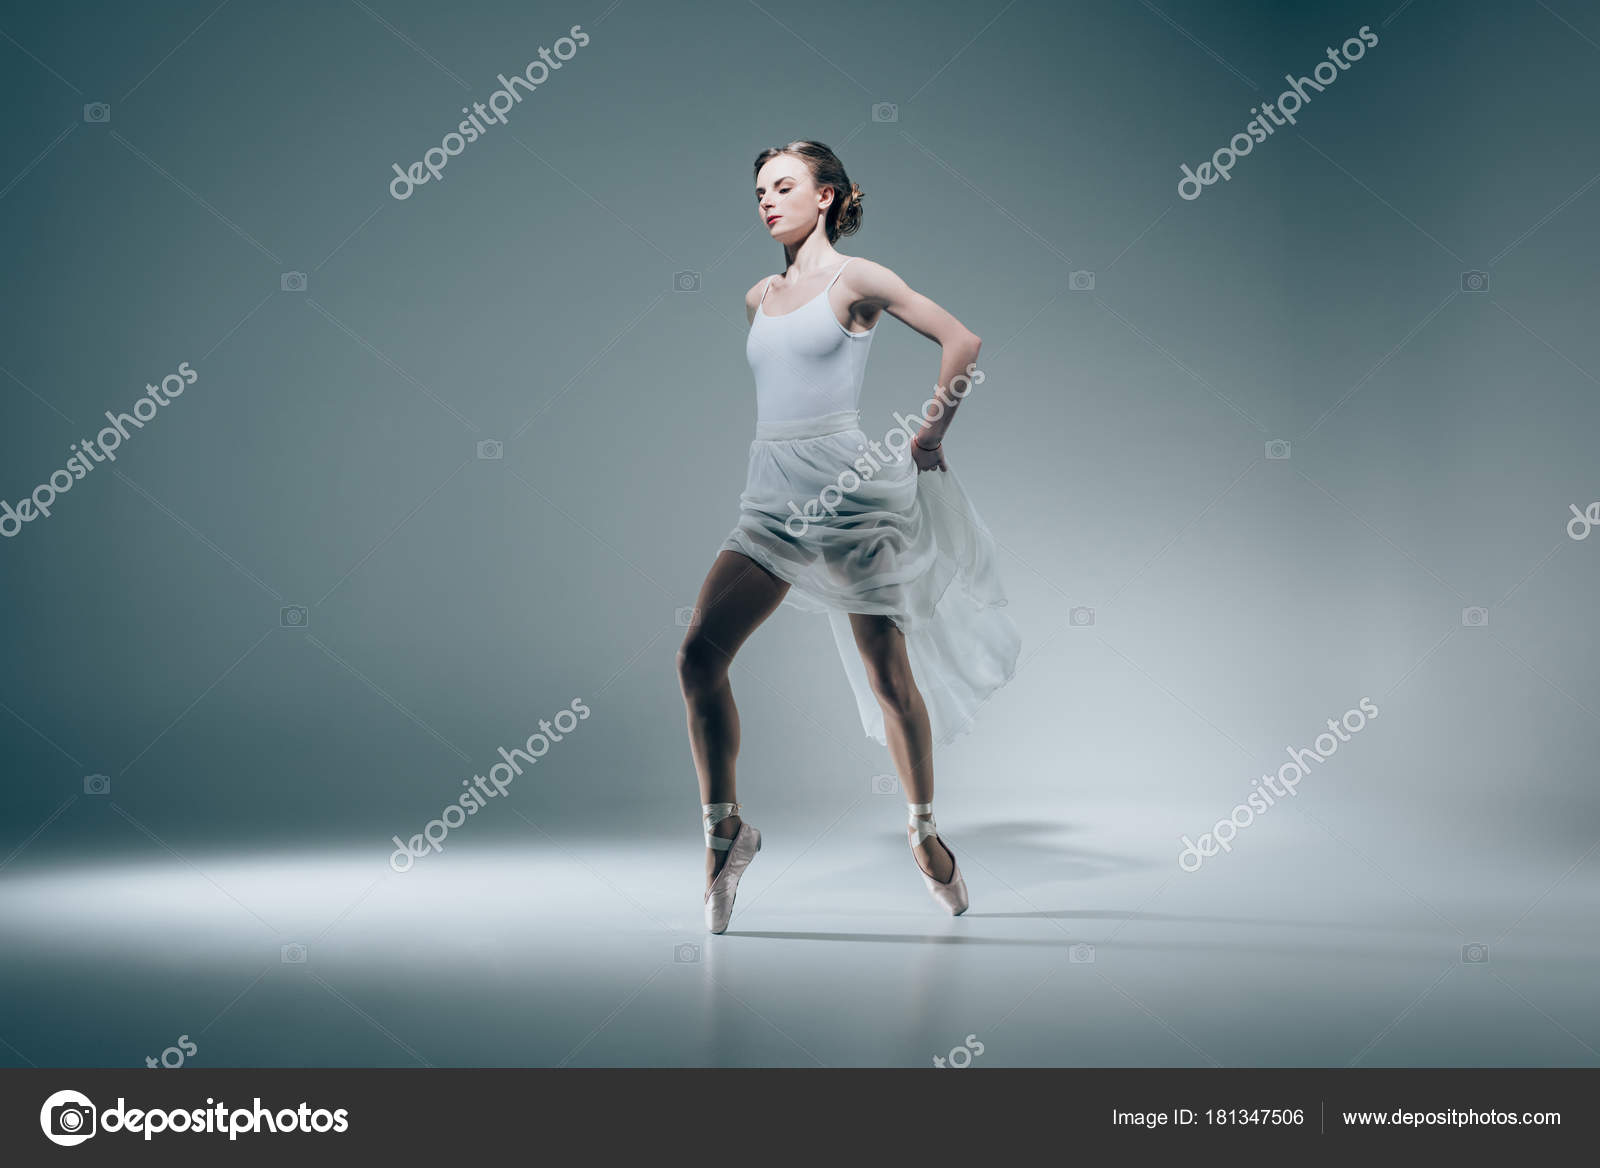 Картинка танцующей девочки